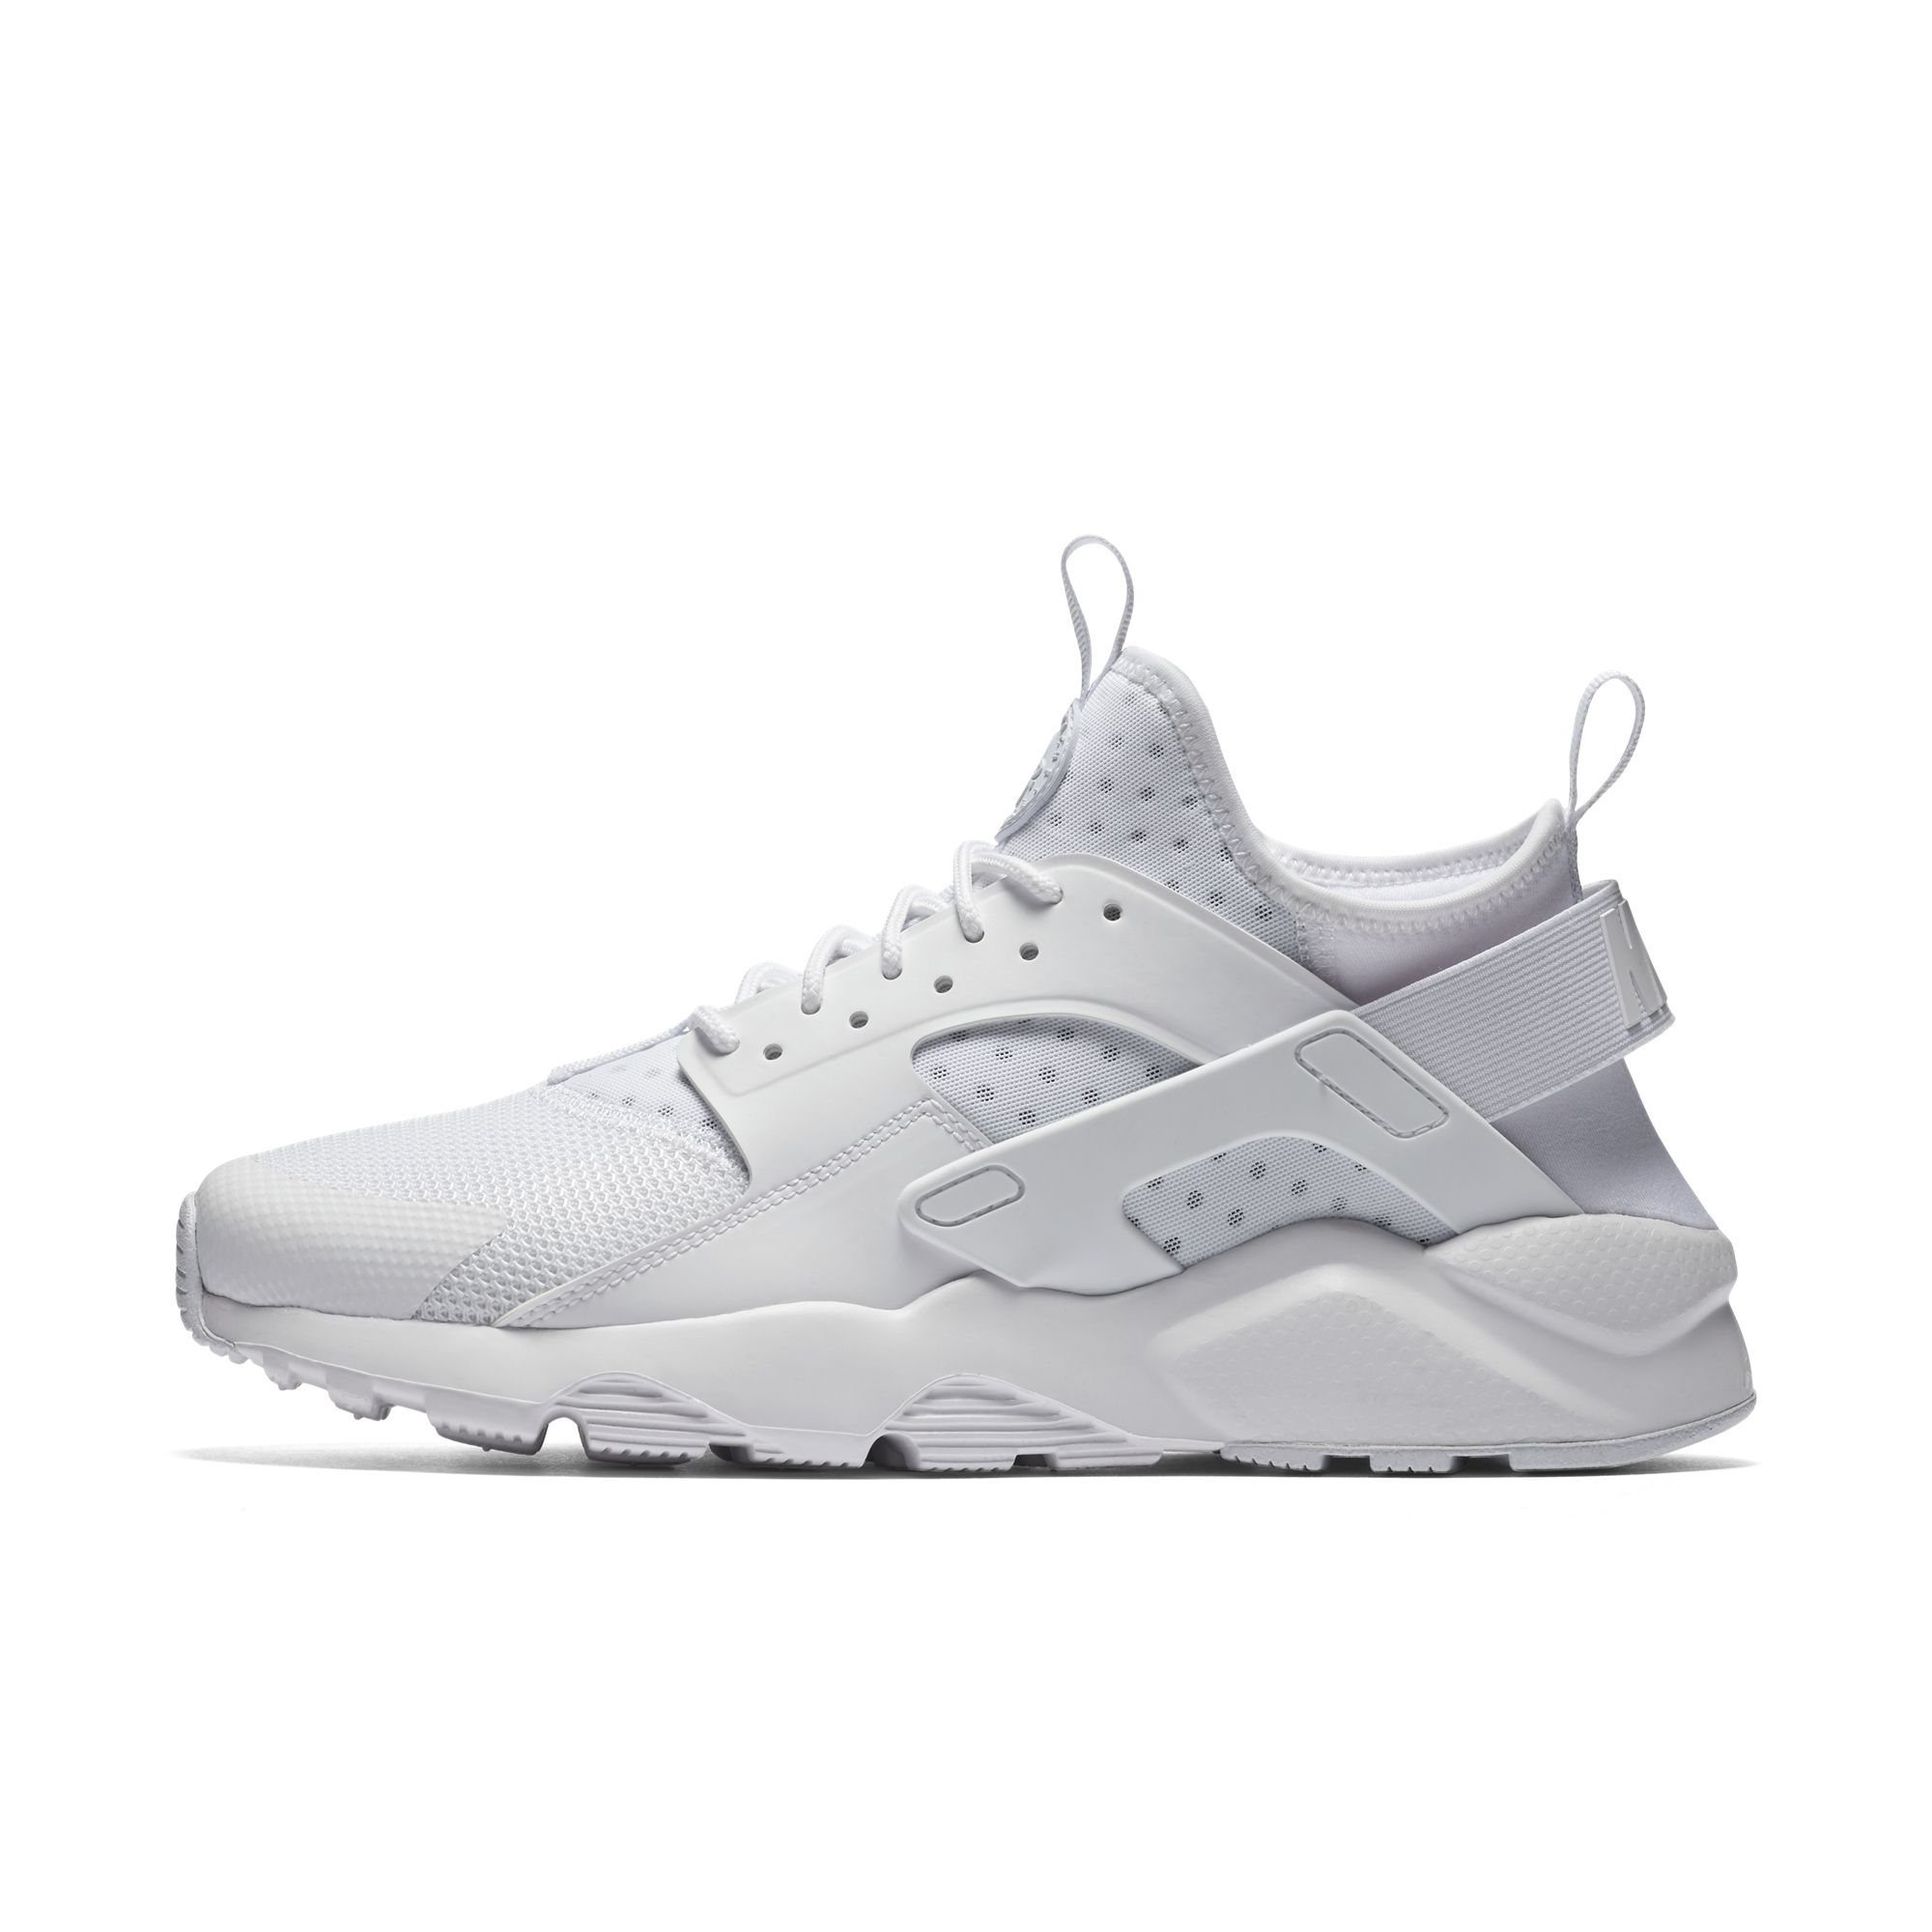 da3652baeed Original New Arrival Official NIKE AIR HUARACHE RUN ULTRA Men s Running  Shoes Sneakers 819685 Outdoor Ultra